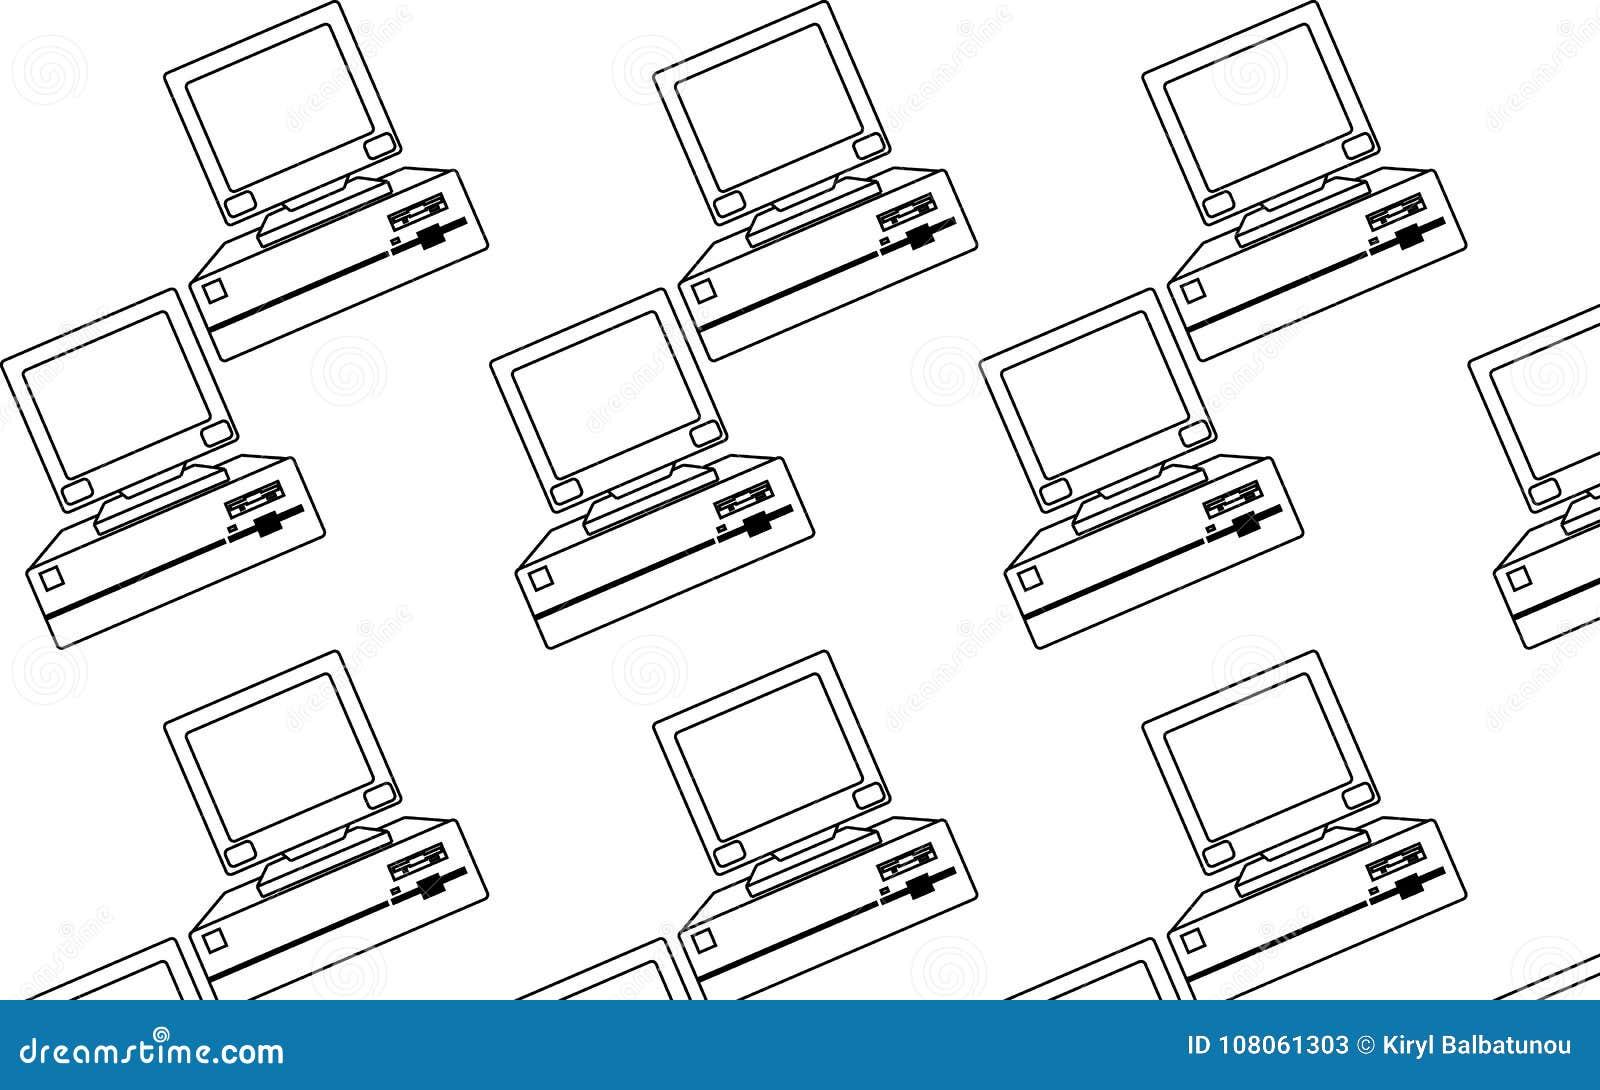 Patroon van zwart-wit, oud, uitstekend, retro, hipster computers met convexe monitors en floppy